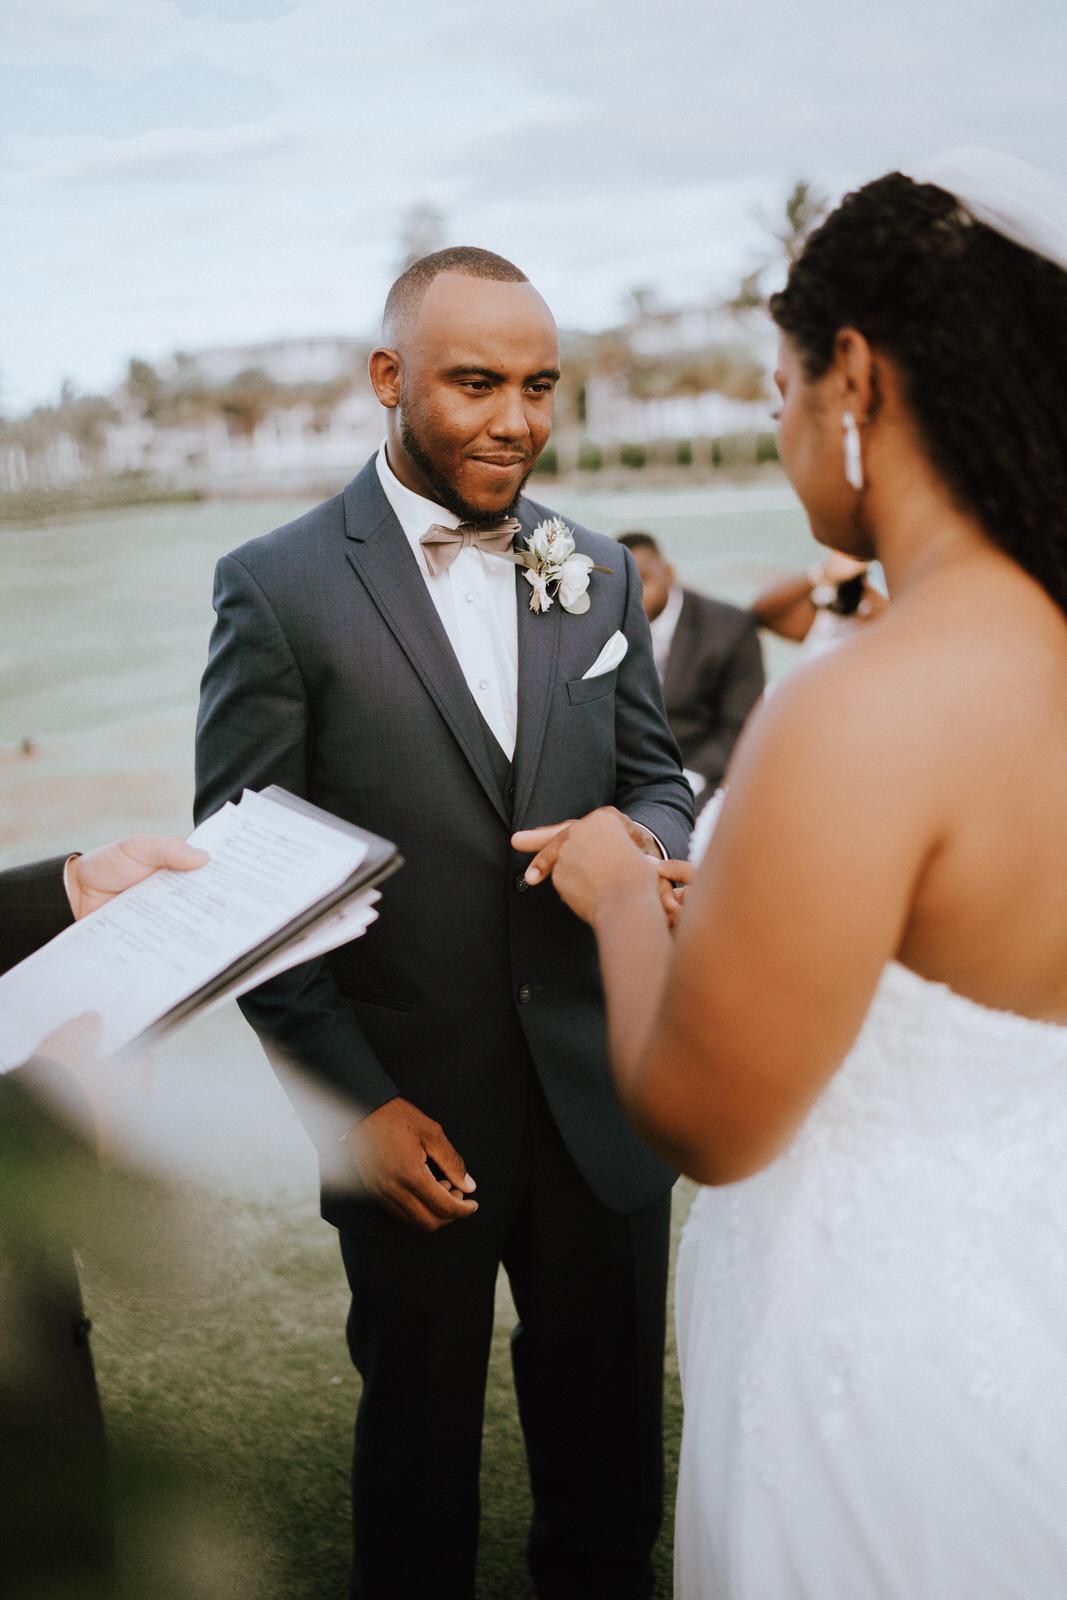 South Seas Island Resort Elopement- Alyana and Shawn- Michelle Gonzalez Photography-484.JPG